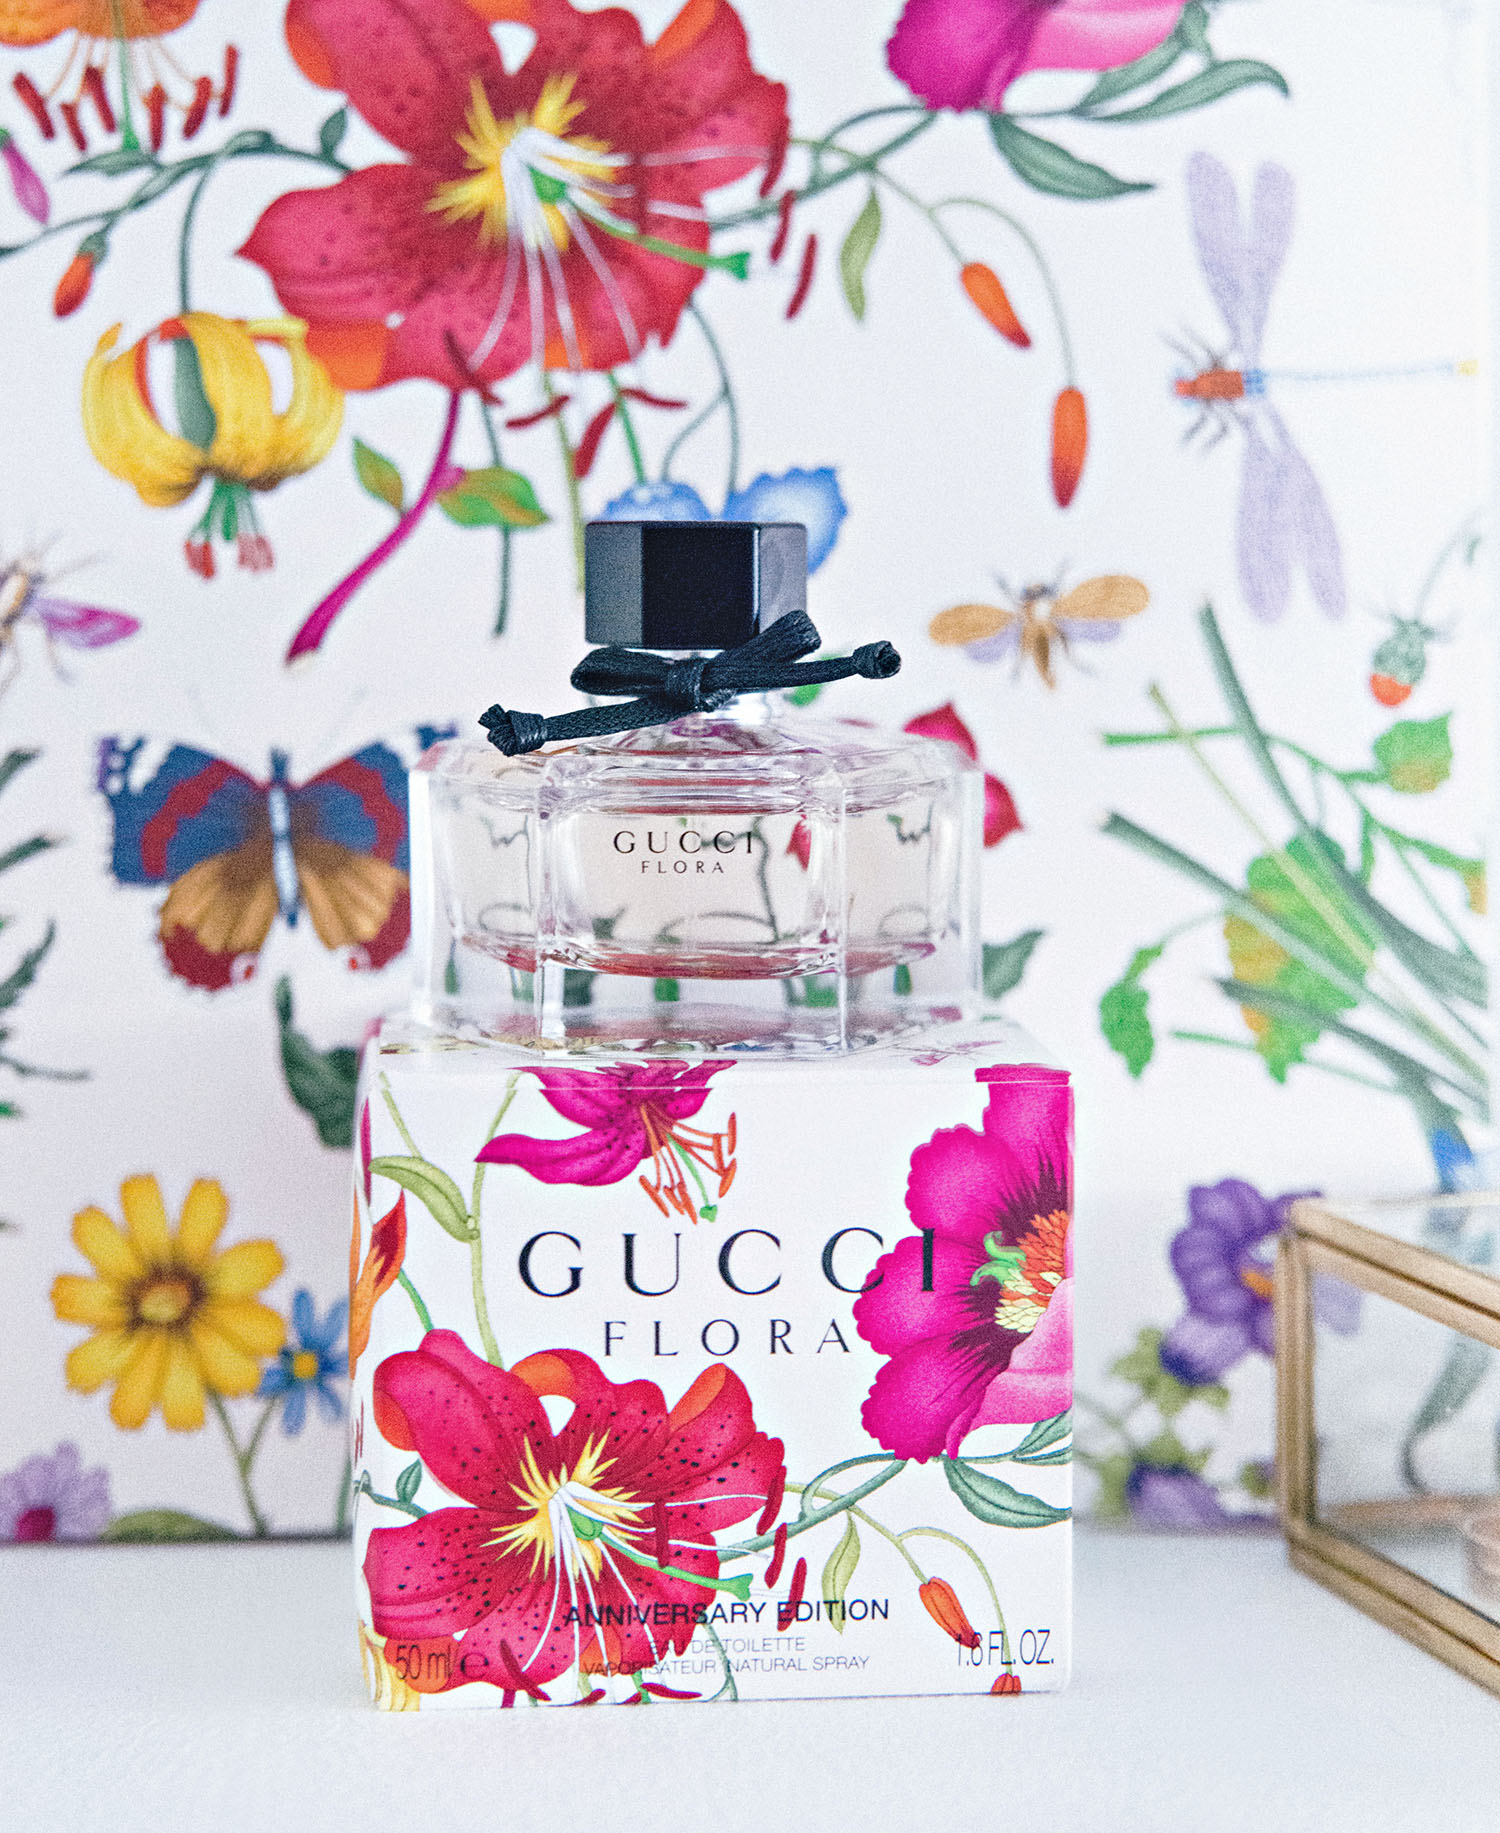 Gucci Flora Anniversary Edition Perfume